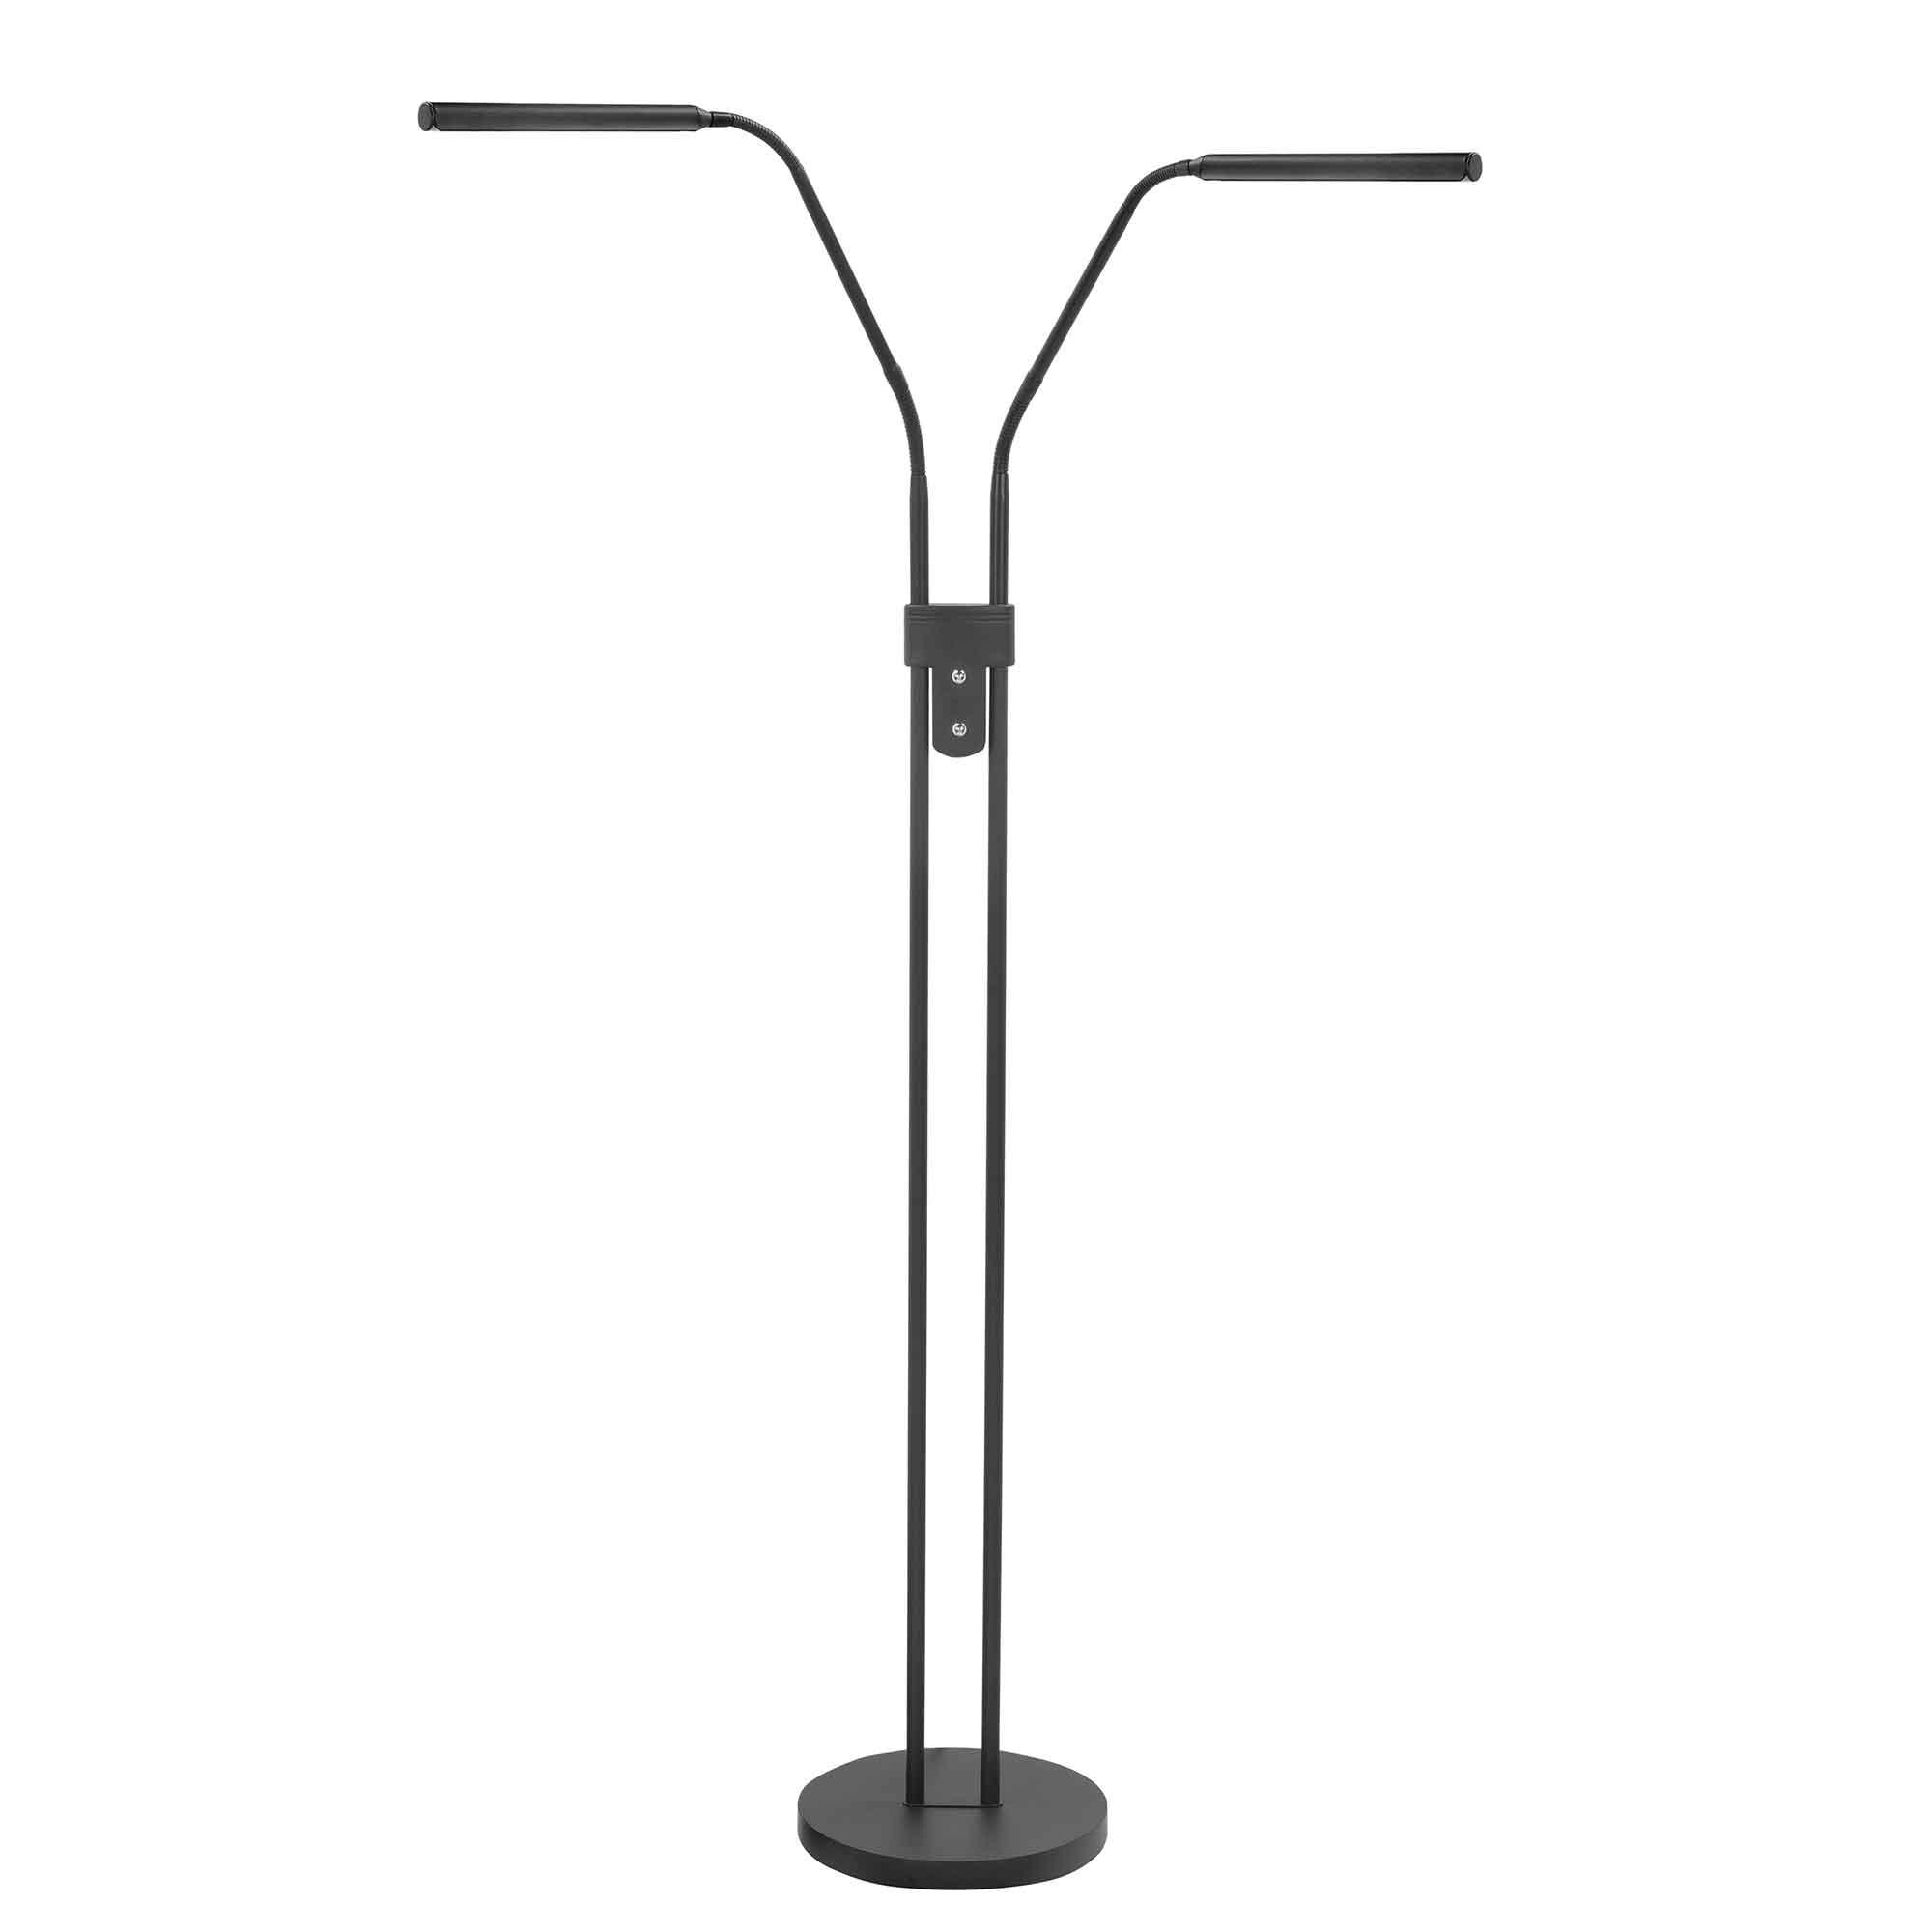 Highlight Vloerlamp Murcia 2 lichts H 145 cm zwart